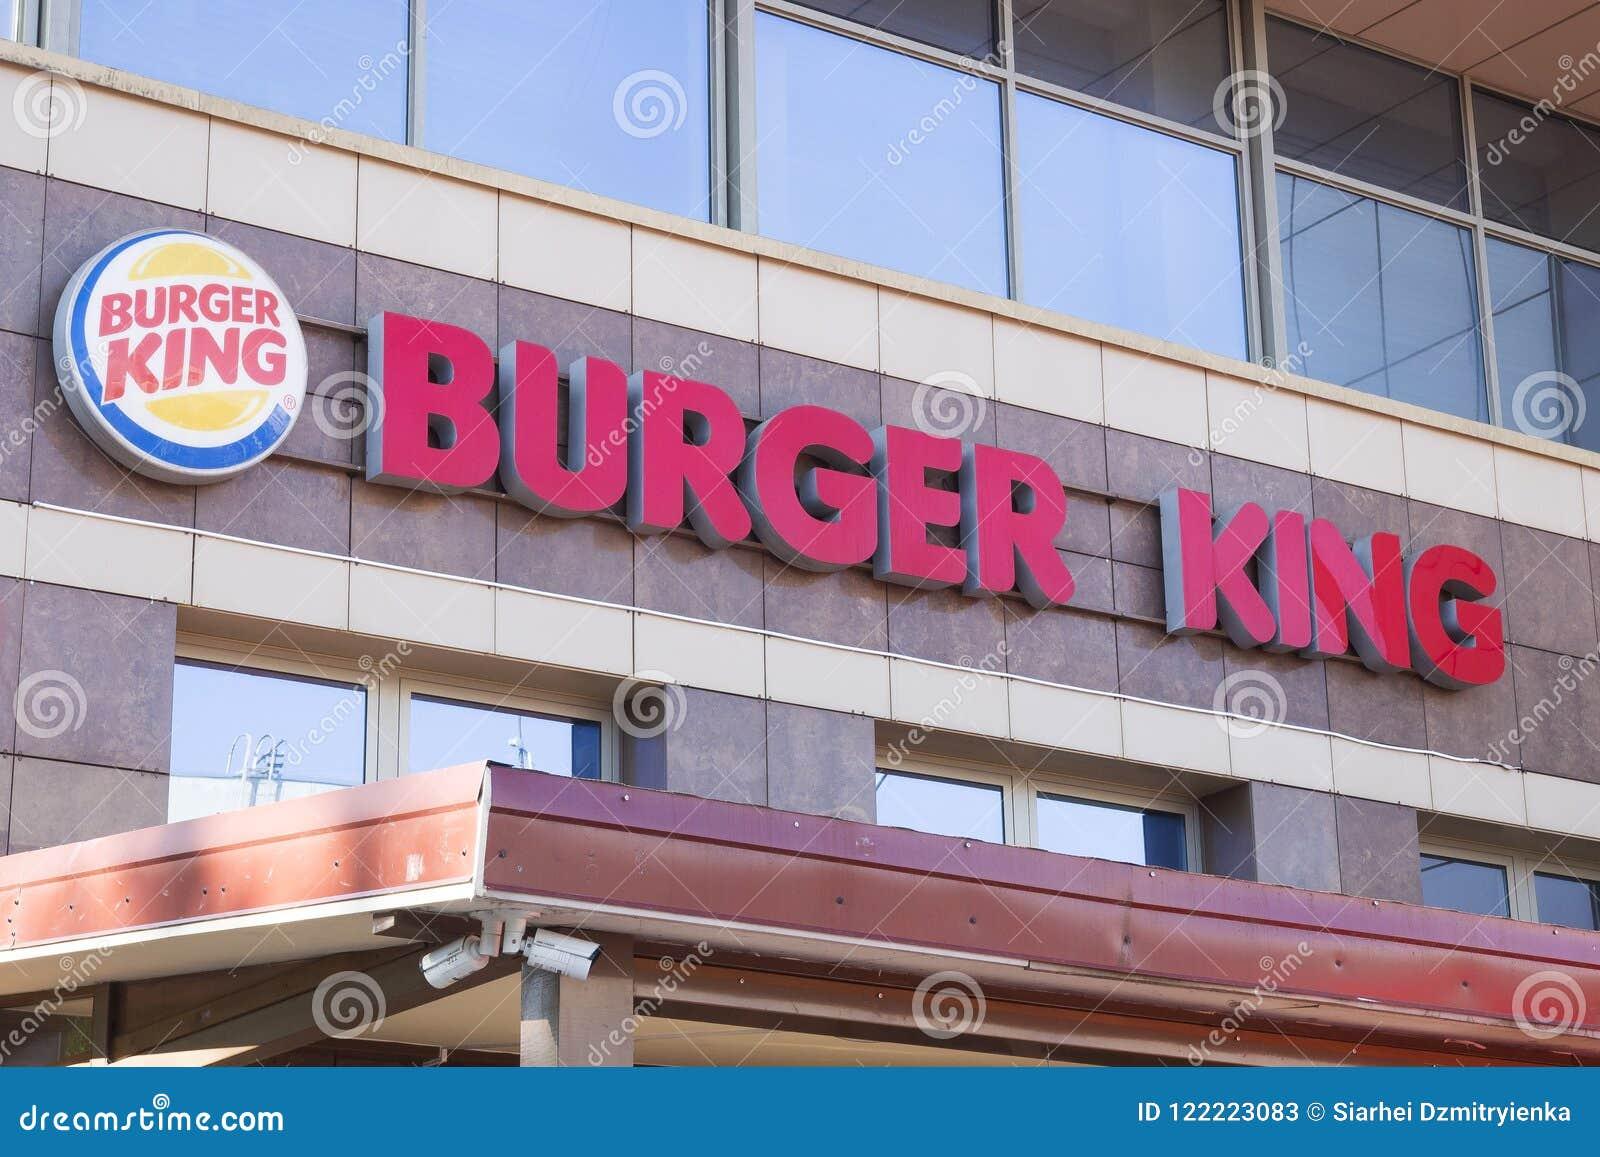 Minsk, Belarus - July 8, 2018: Inscription signboard burger king on the facade of the building in Minsk